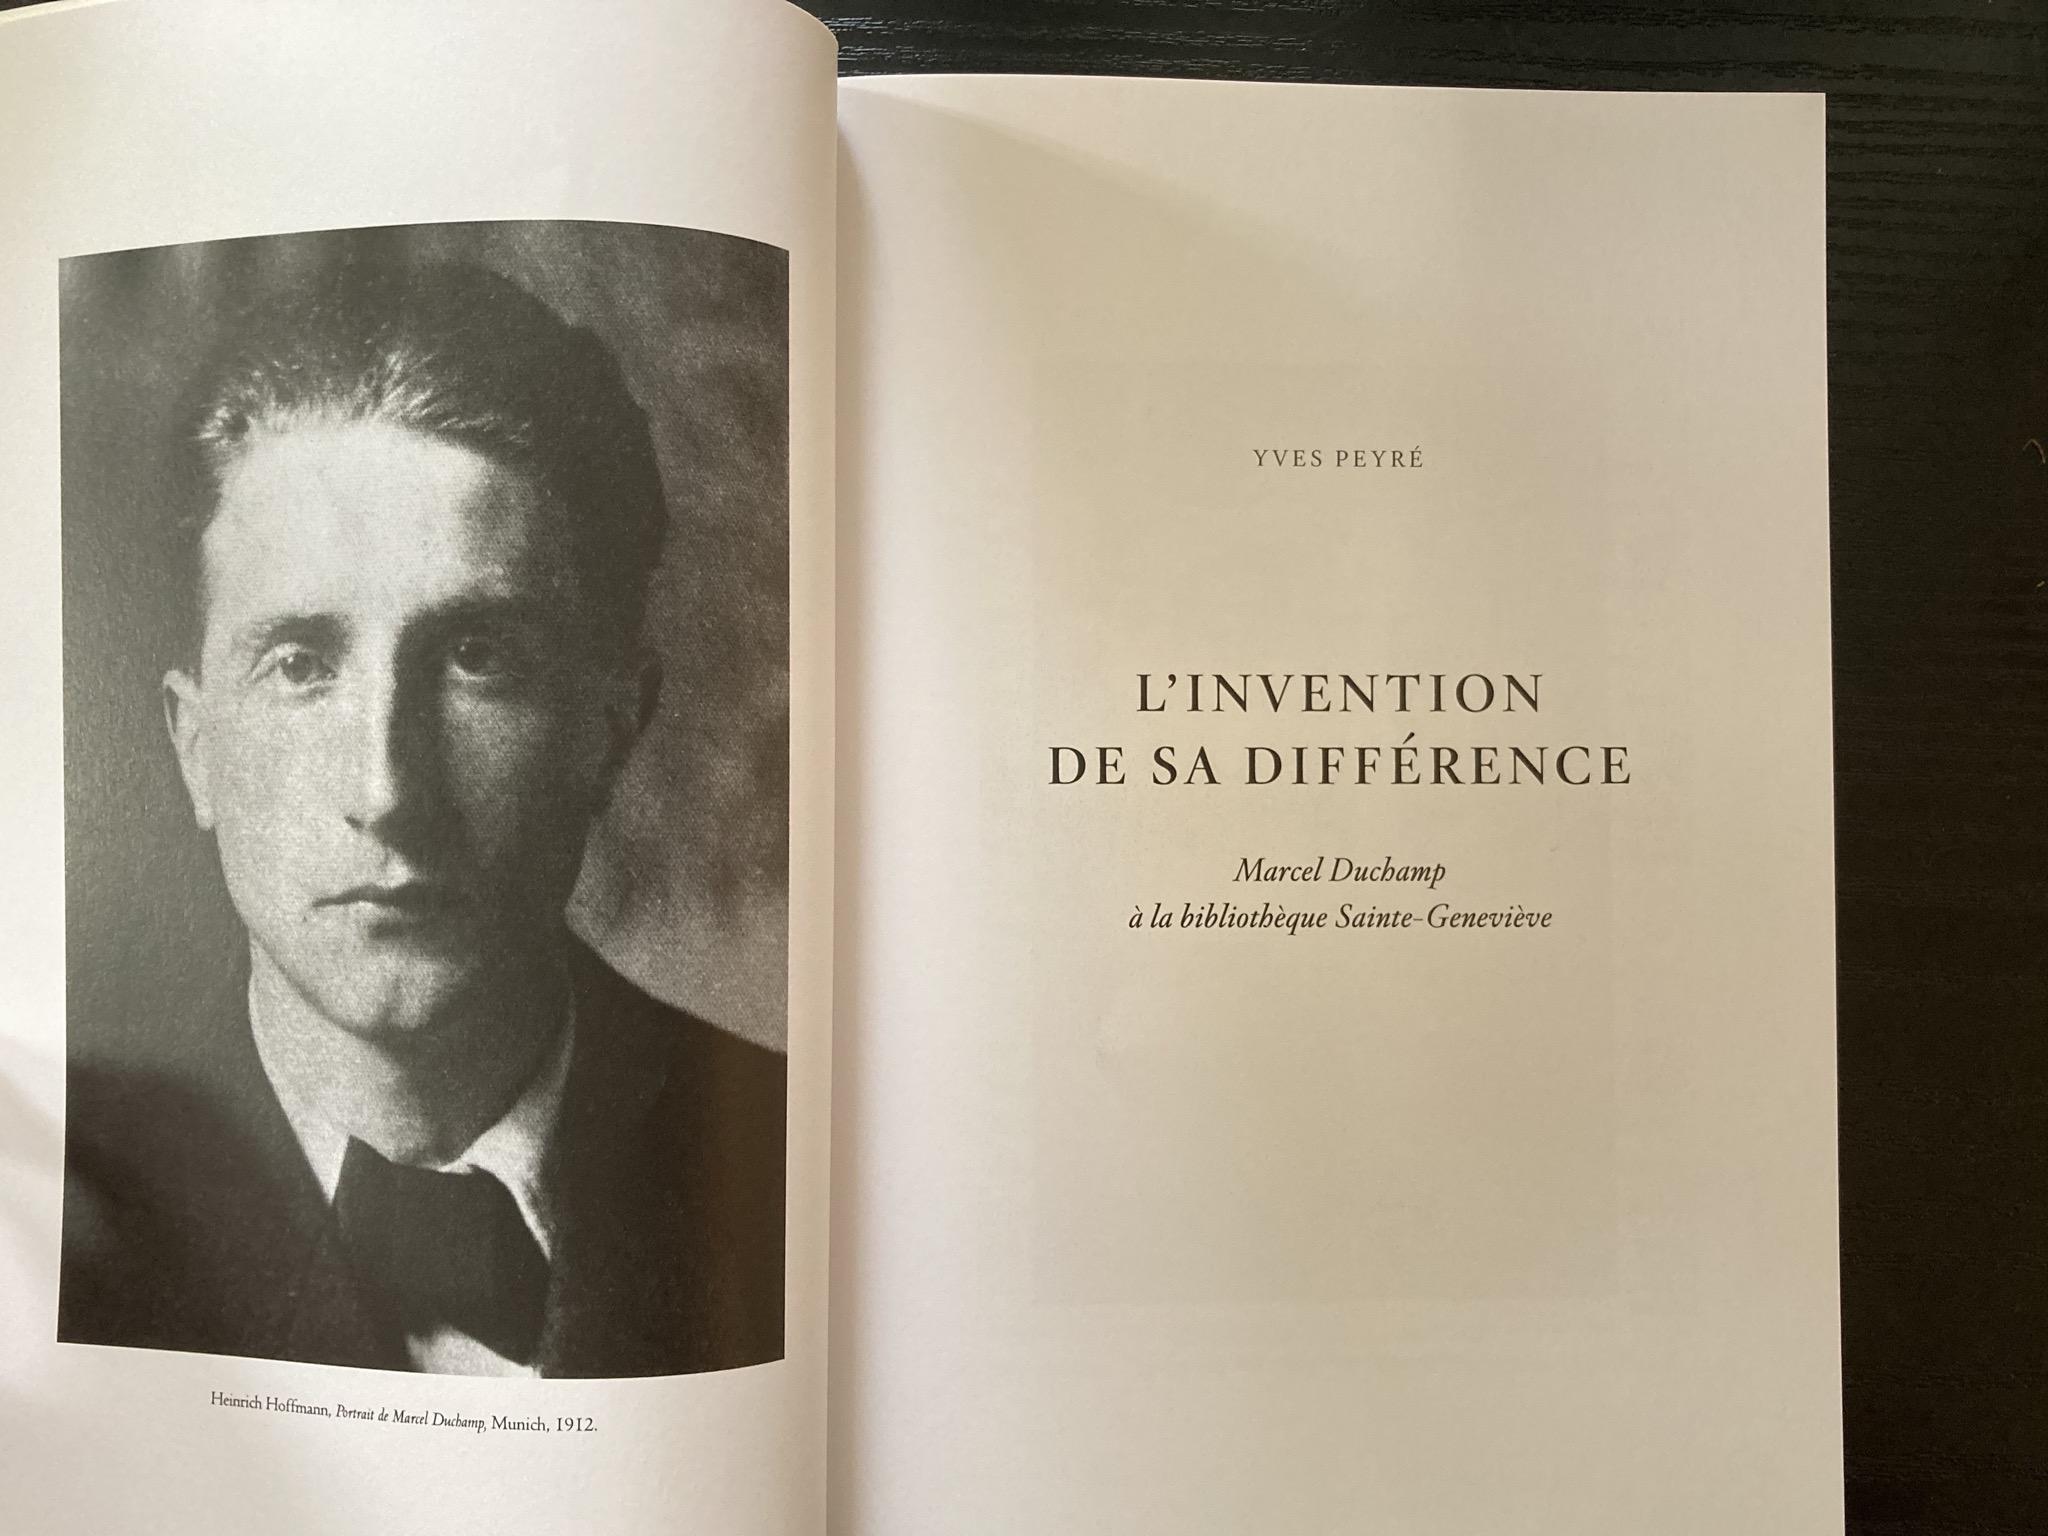 Duchamp as a Librarian and PWA 2020 presentation in CPH